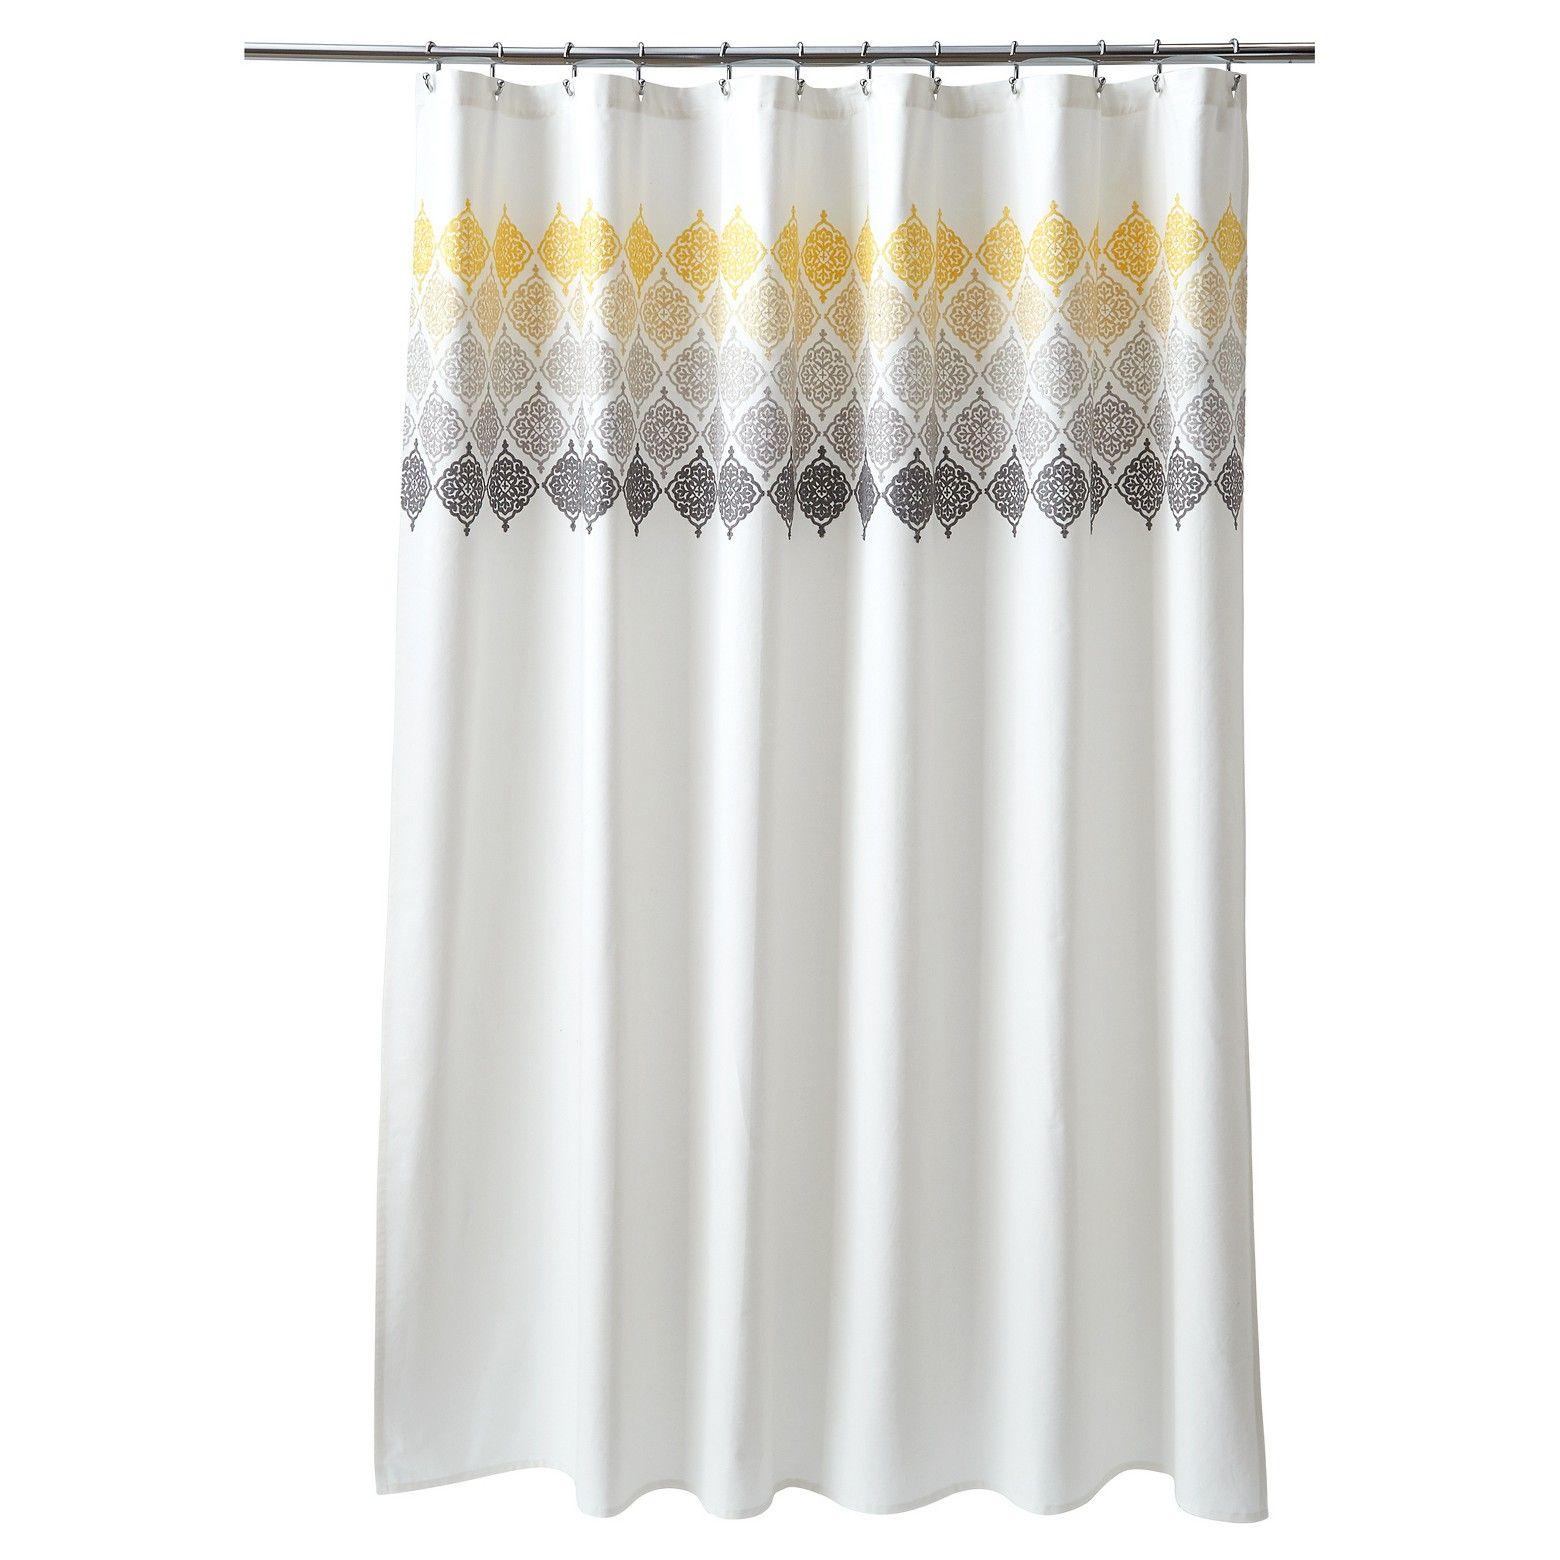 Keep your bathroom ducor looking stylish with the threshold